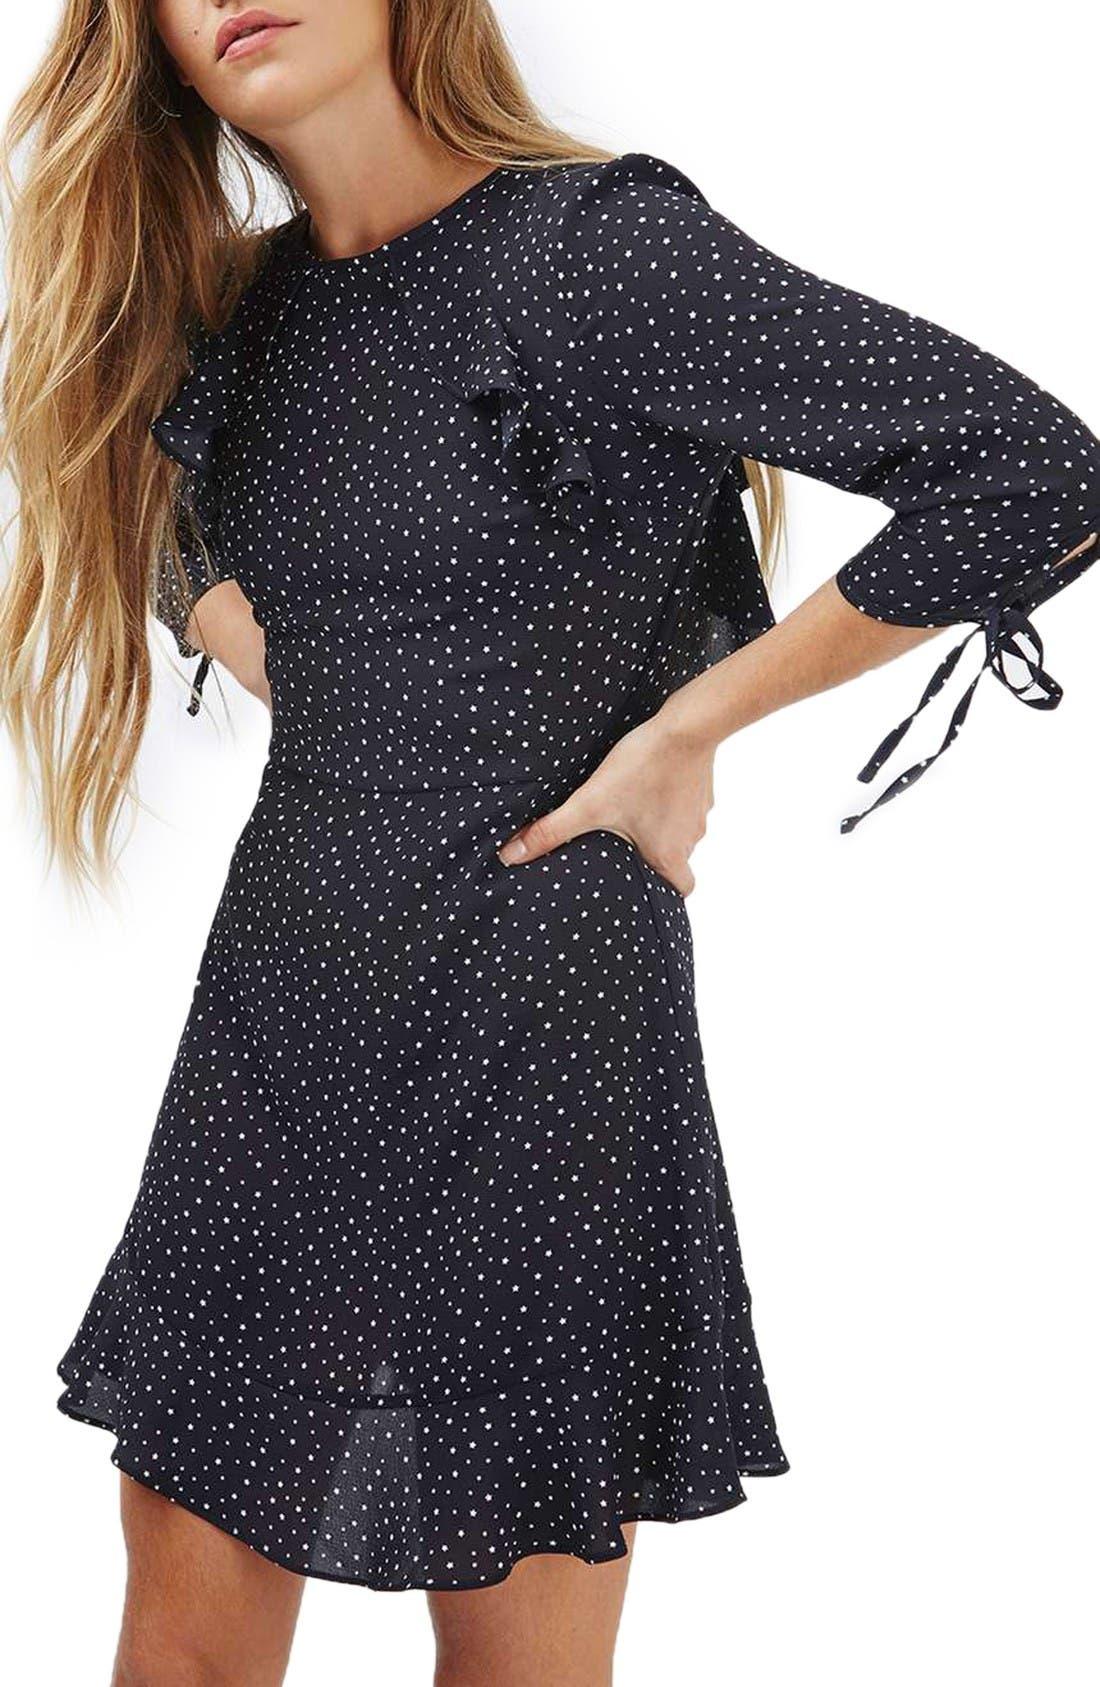 Alternate Image 1 Selected - Topshop Star Ruffle Dress